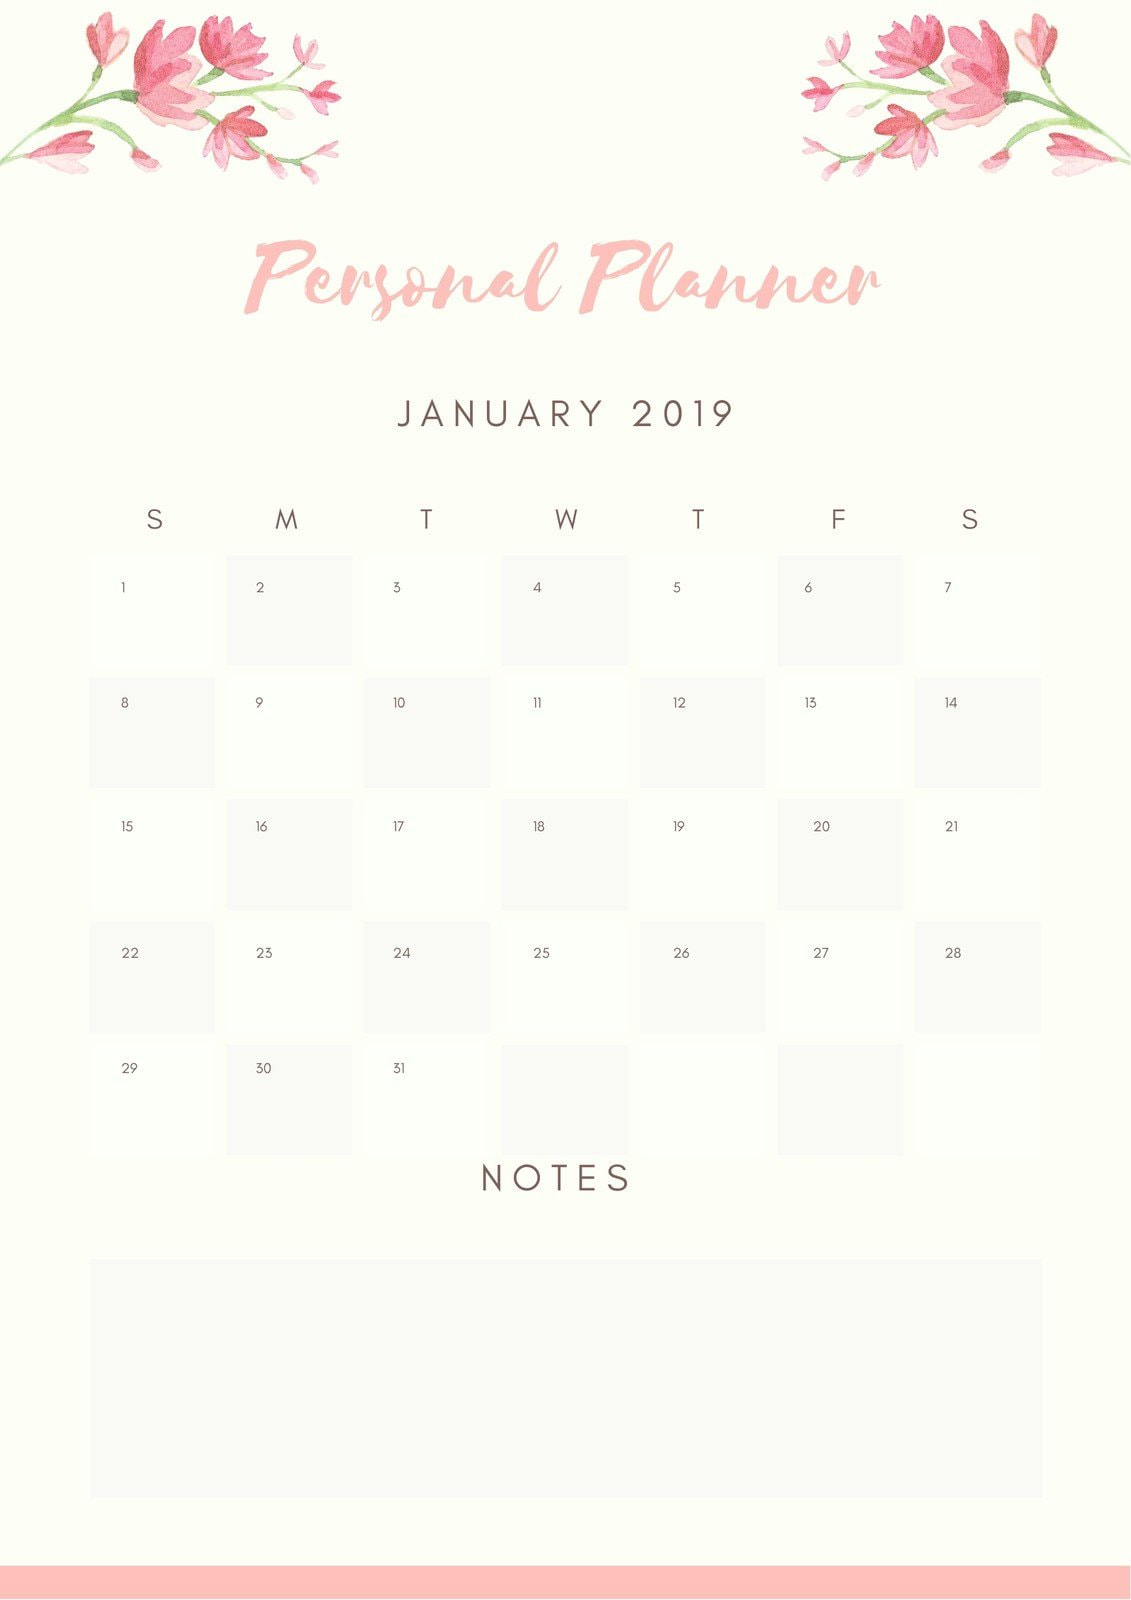 Pastel Pink Floral Border Personal Planner